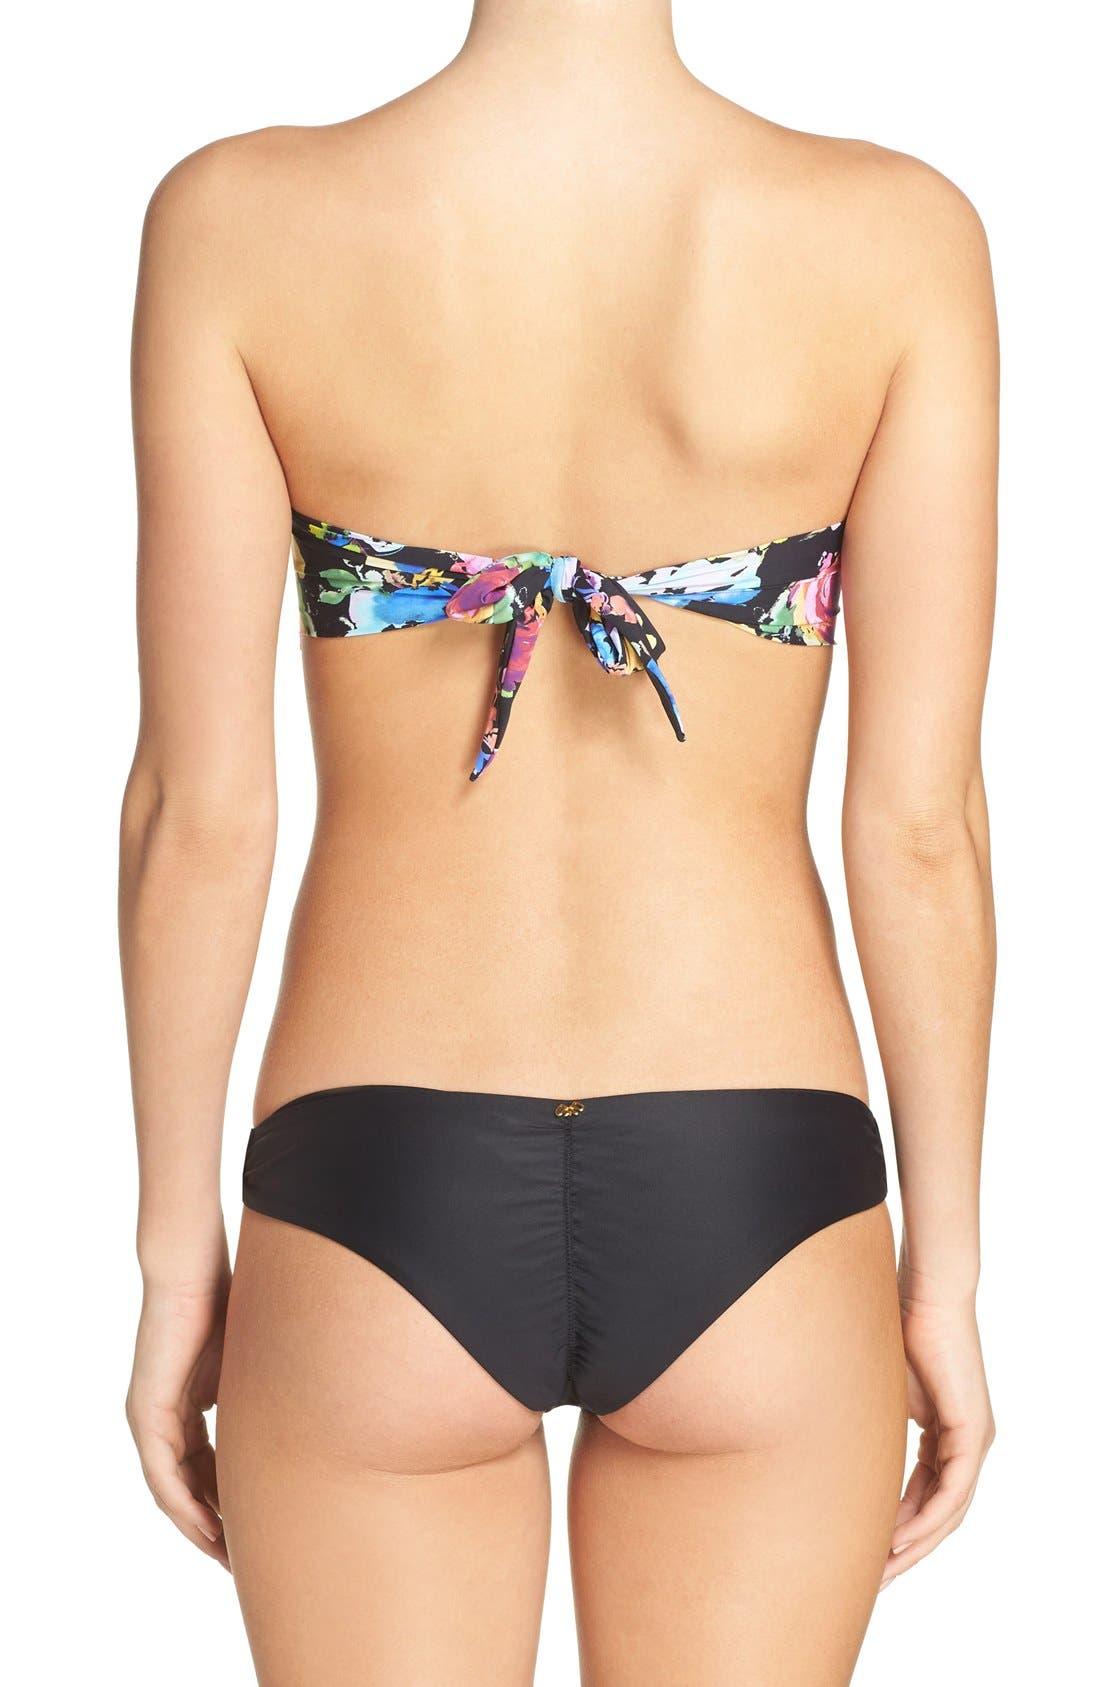 Underwire Bandeau Bikini Top,                             Alternate thumbnail 9, color,                             001